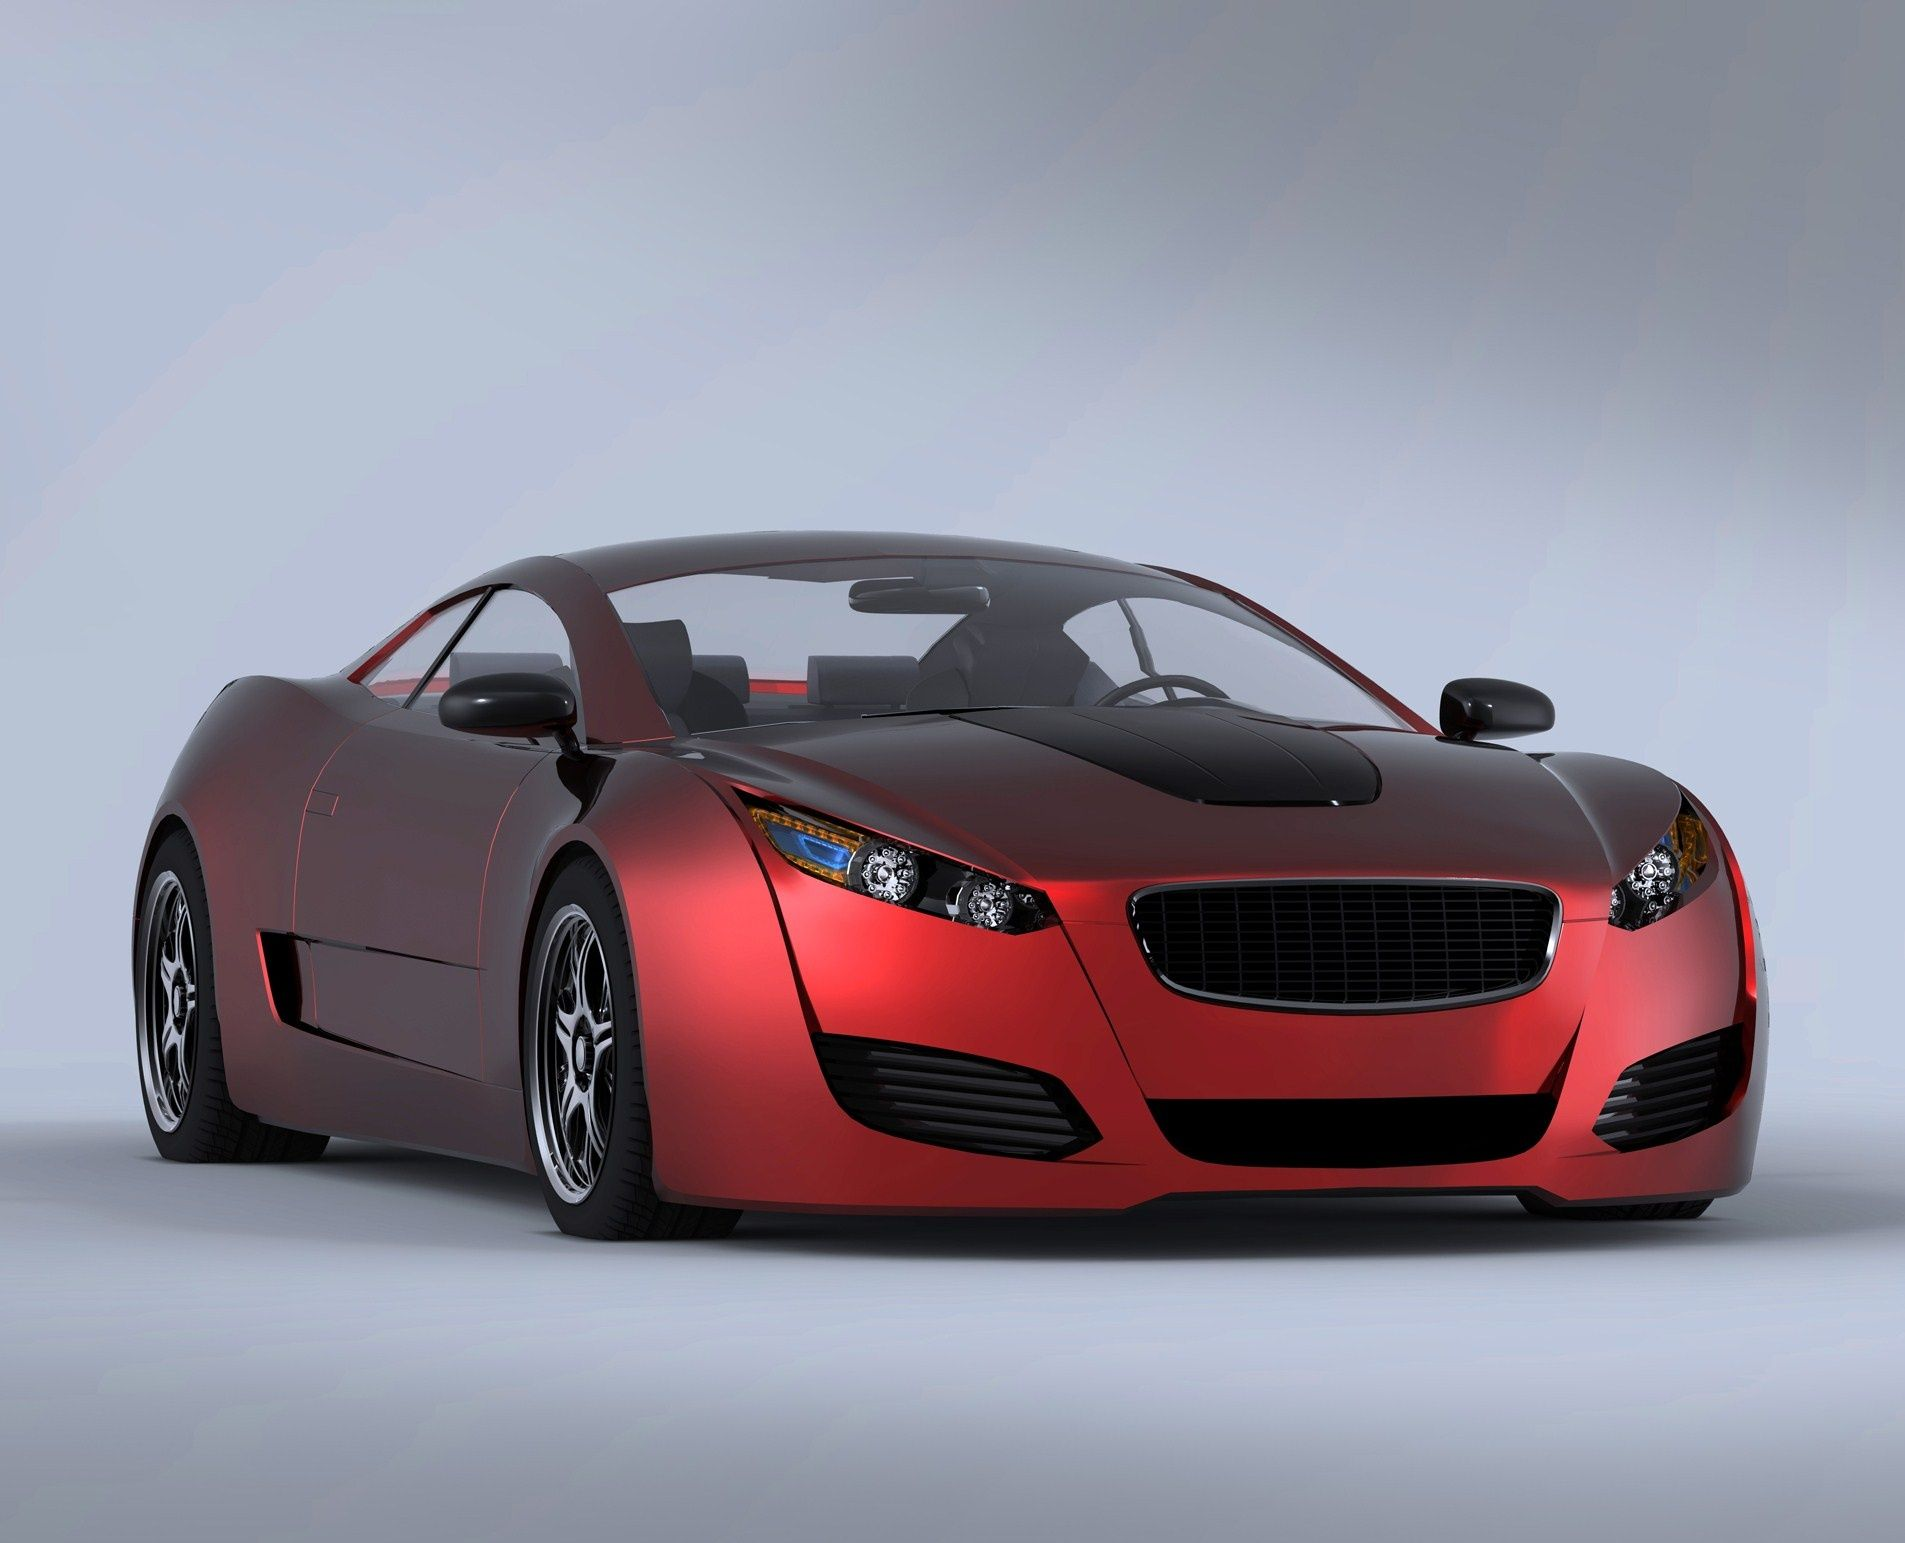 supercaraston Super cars, European cars, Concept cars